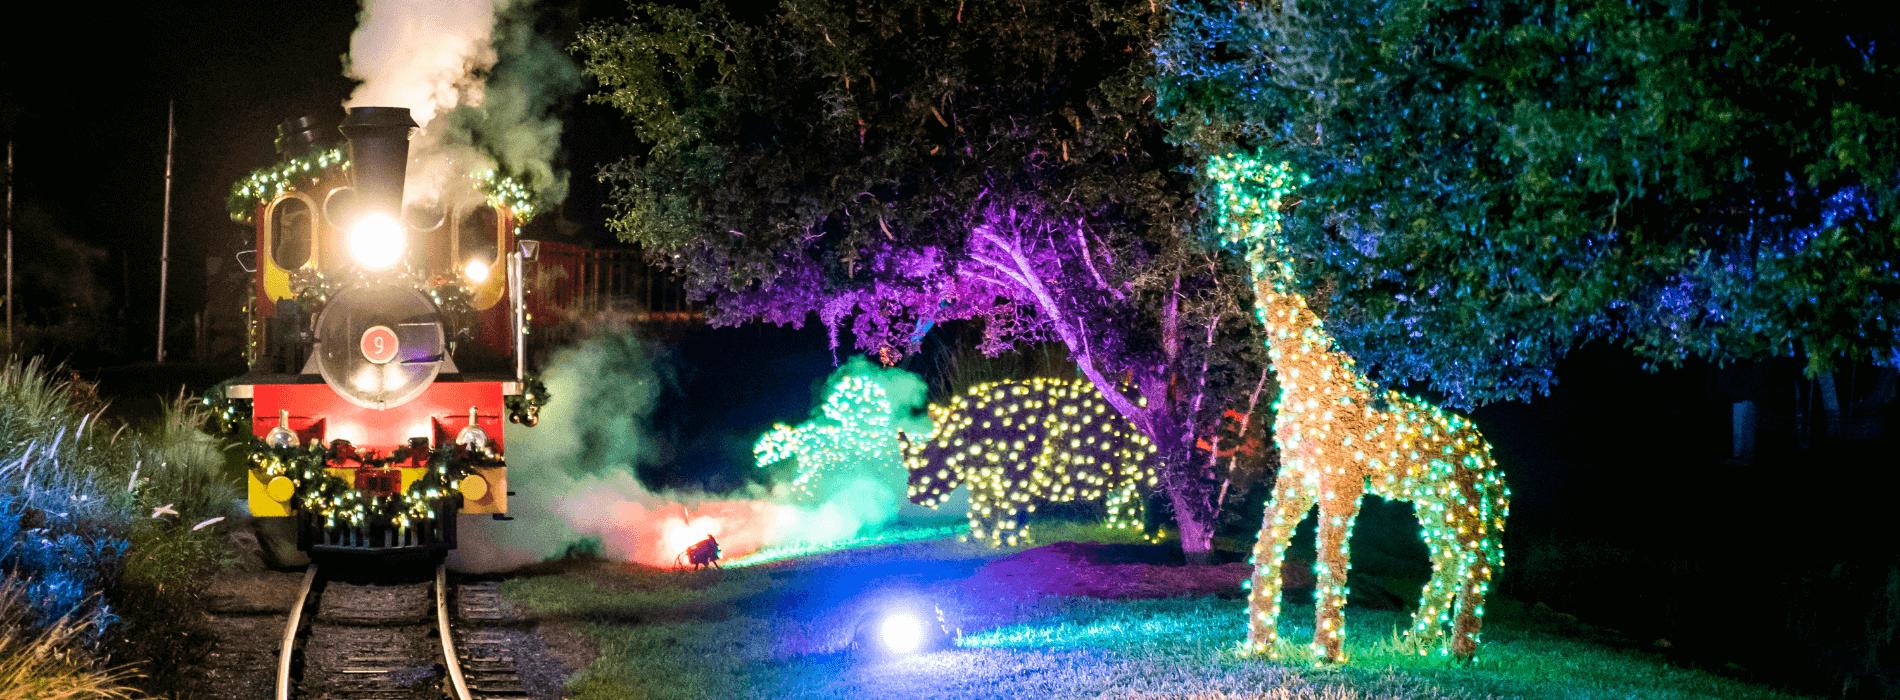 Christmas Town no parque Busch Gardens: Jingle Bell Express Train Ride na Christmas Town Village